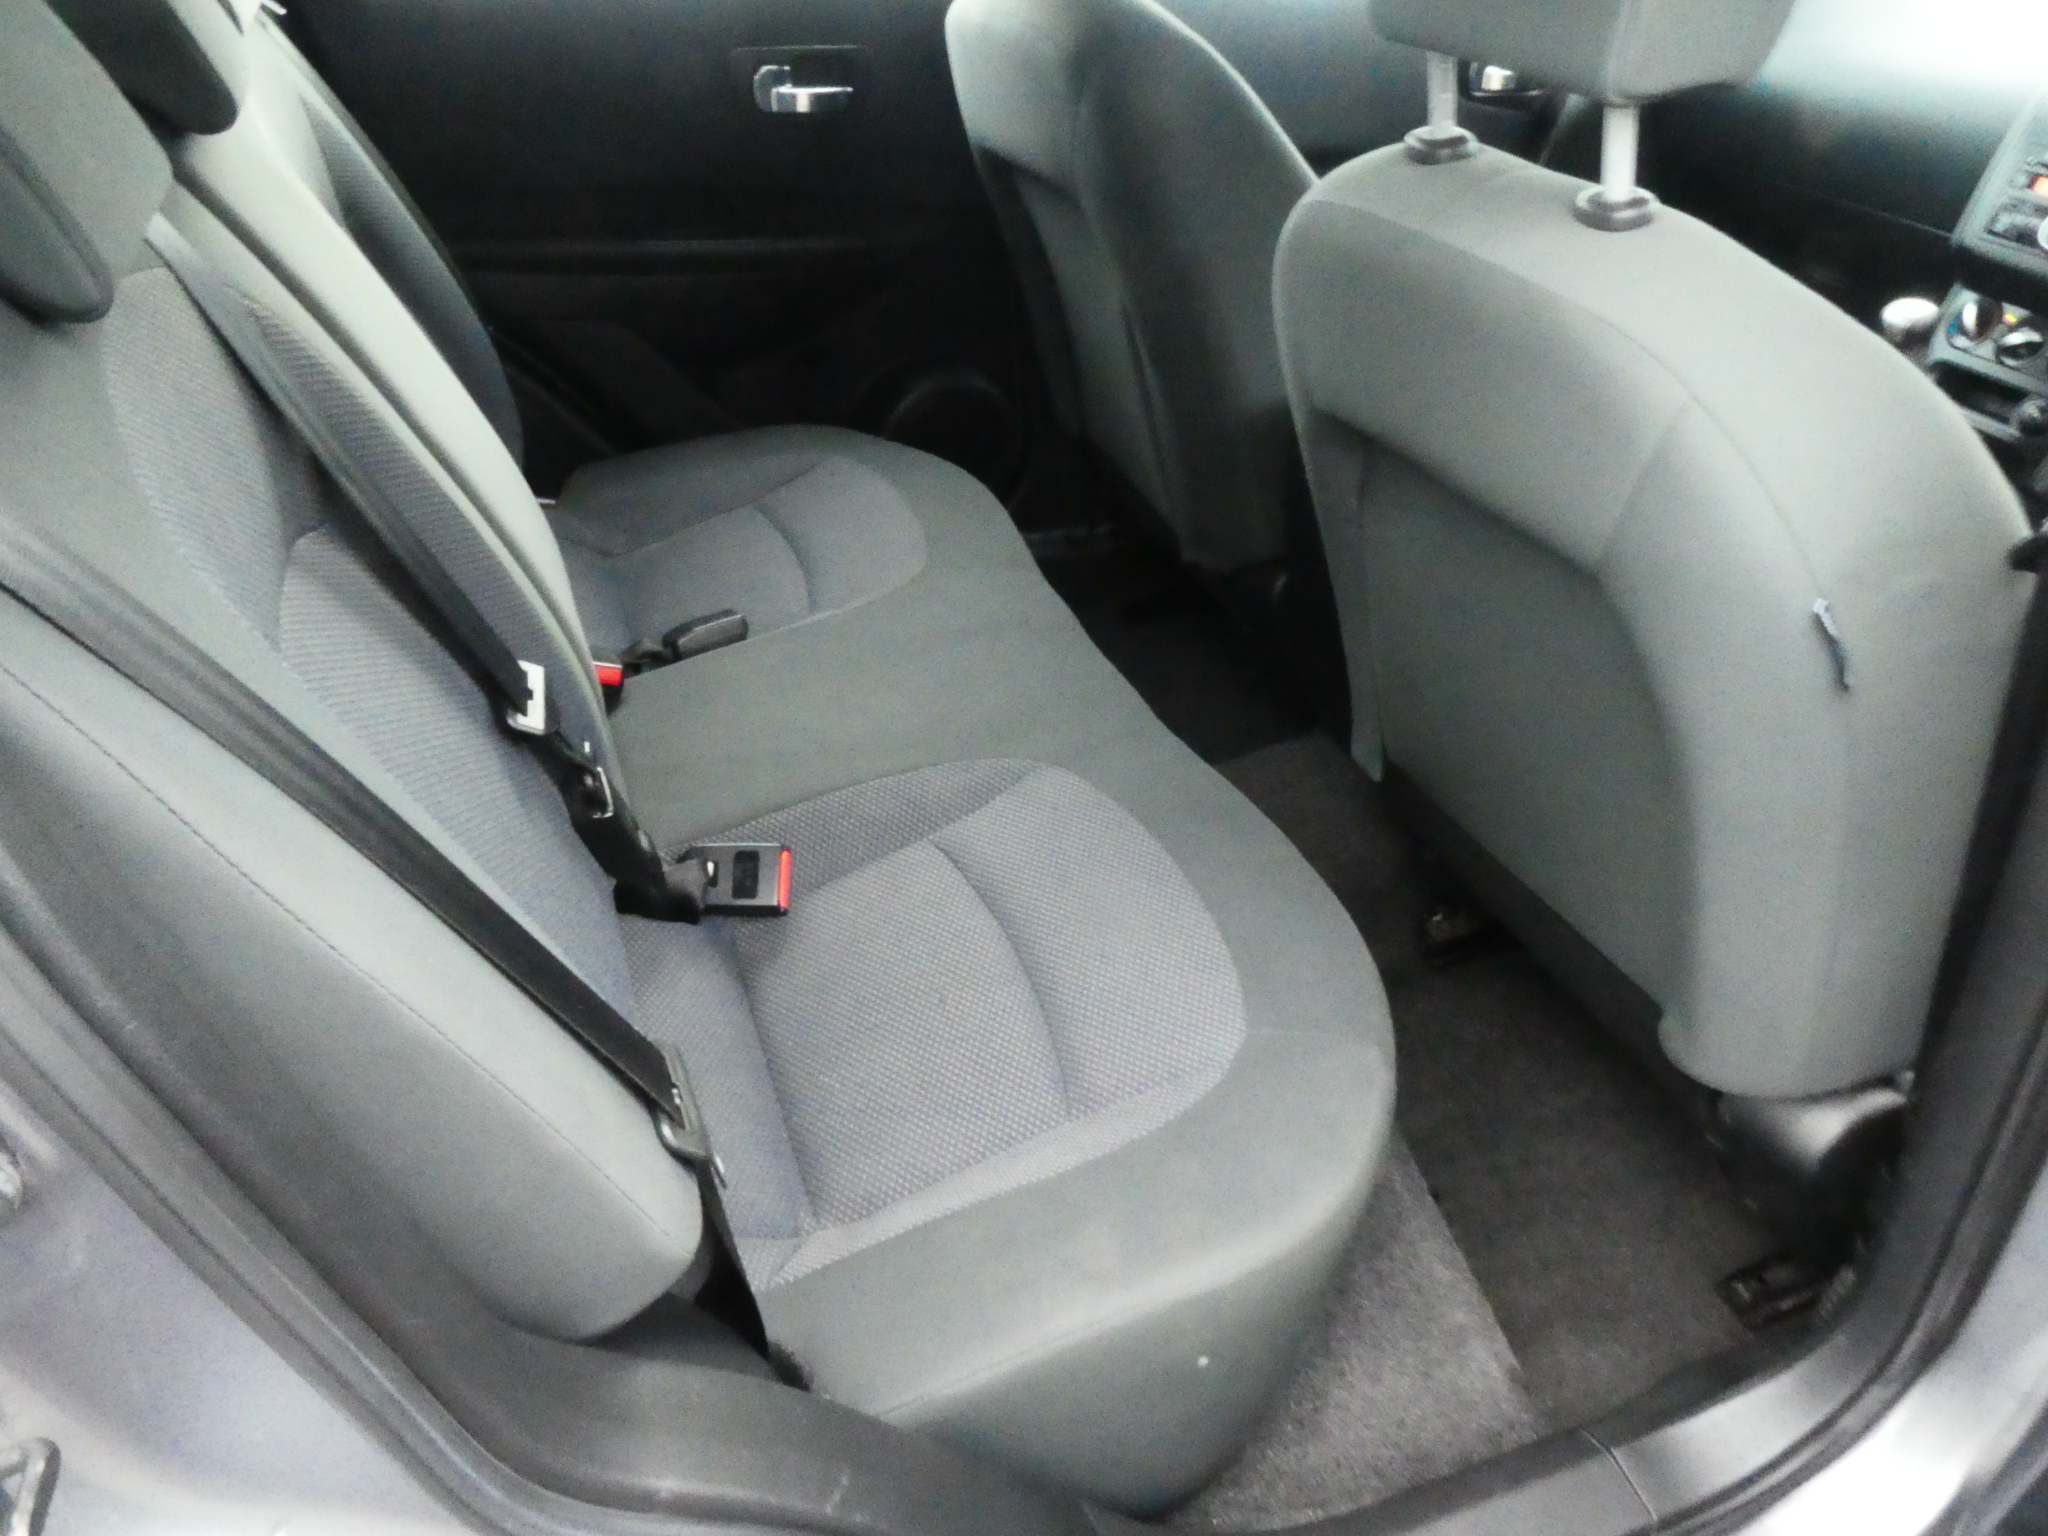 2010 NISSAN Qashqai 1.6 Visia 2WD Petrol Manual low miles full history – FC Motors 52 Carntall Rd, Newtownabbey BT36 5SD full